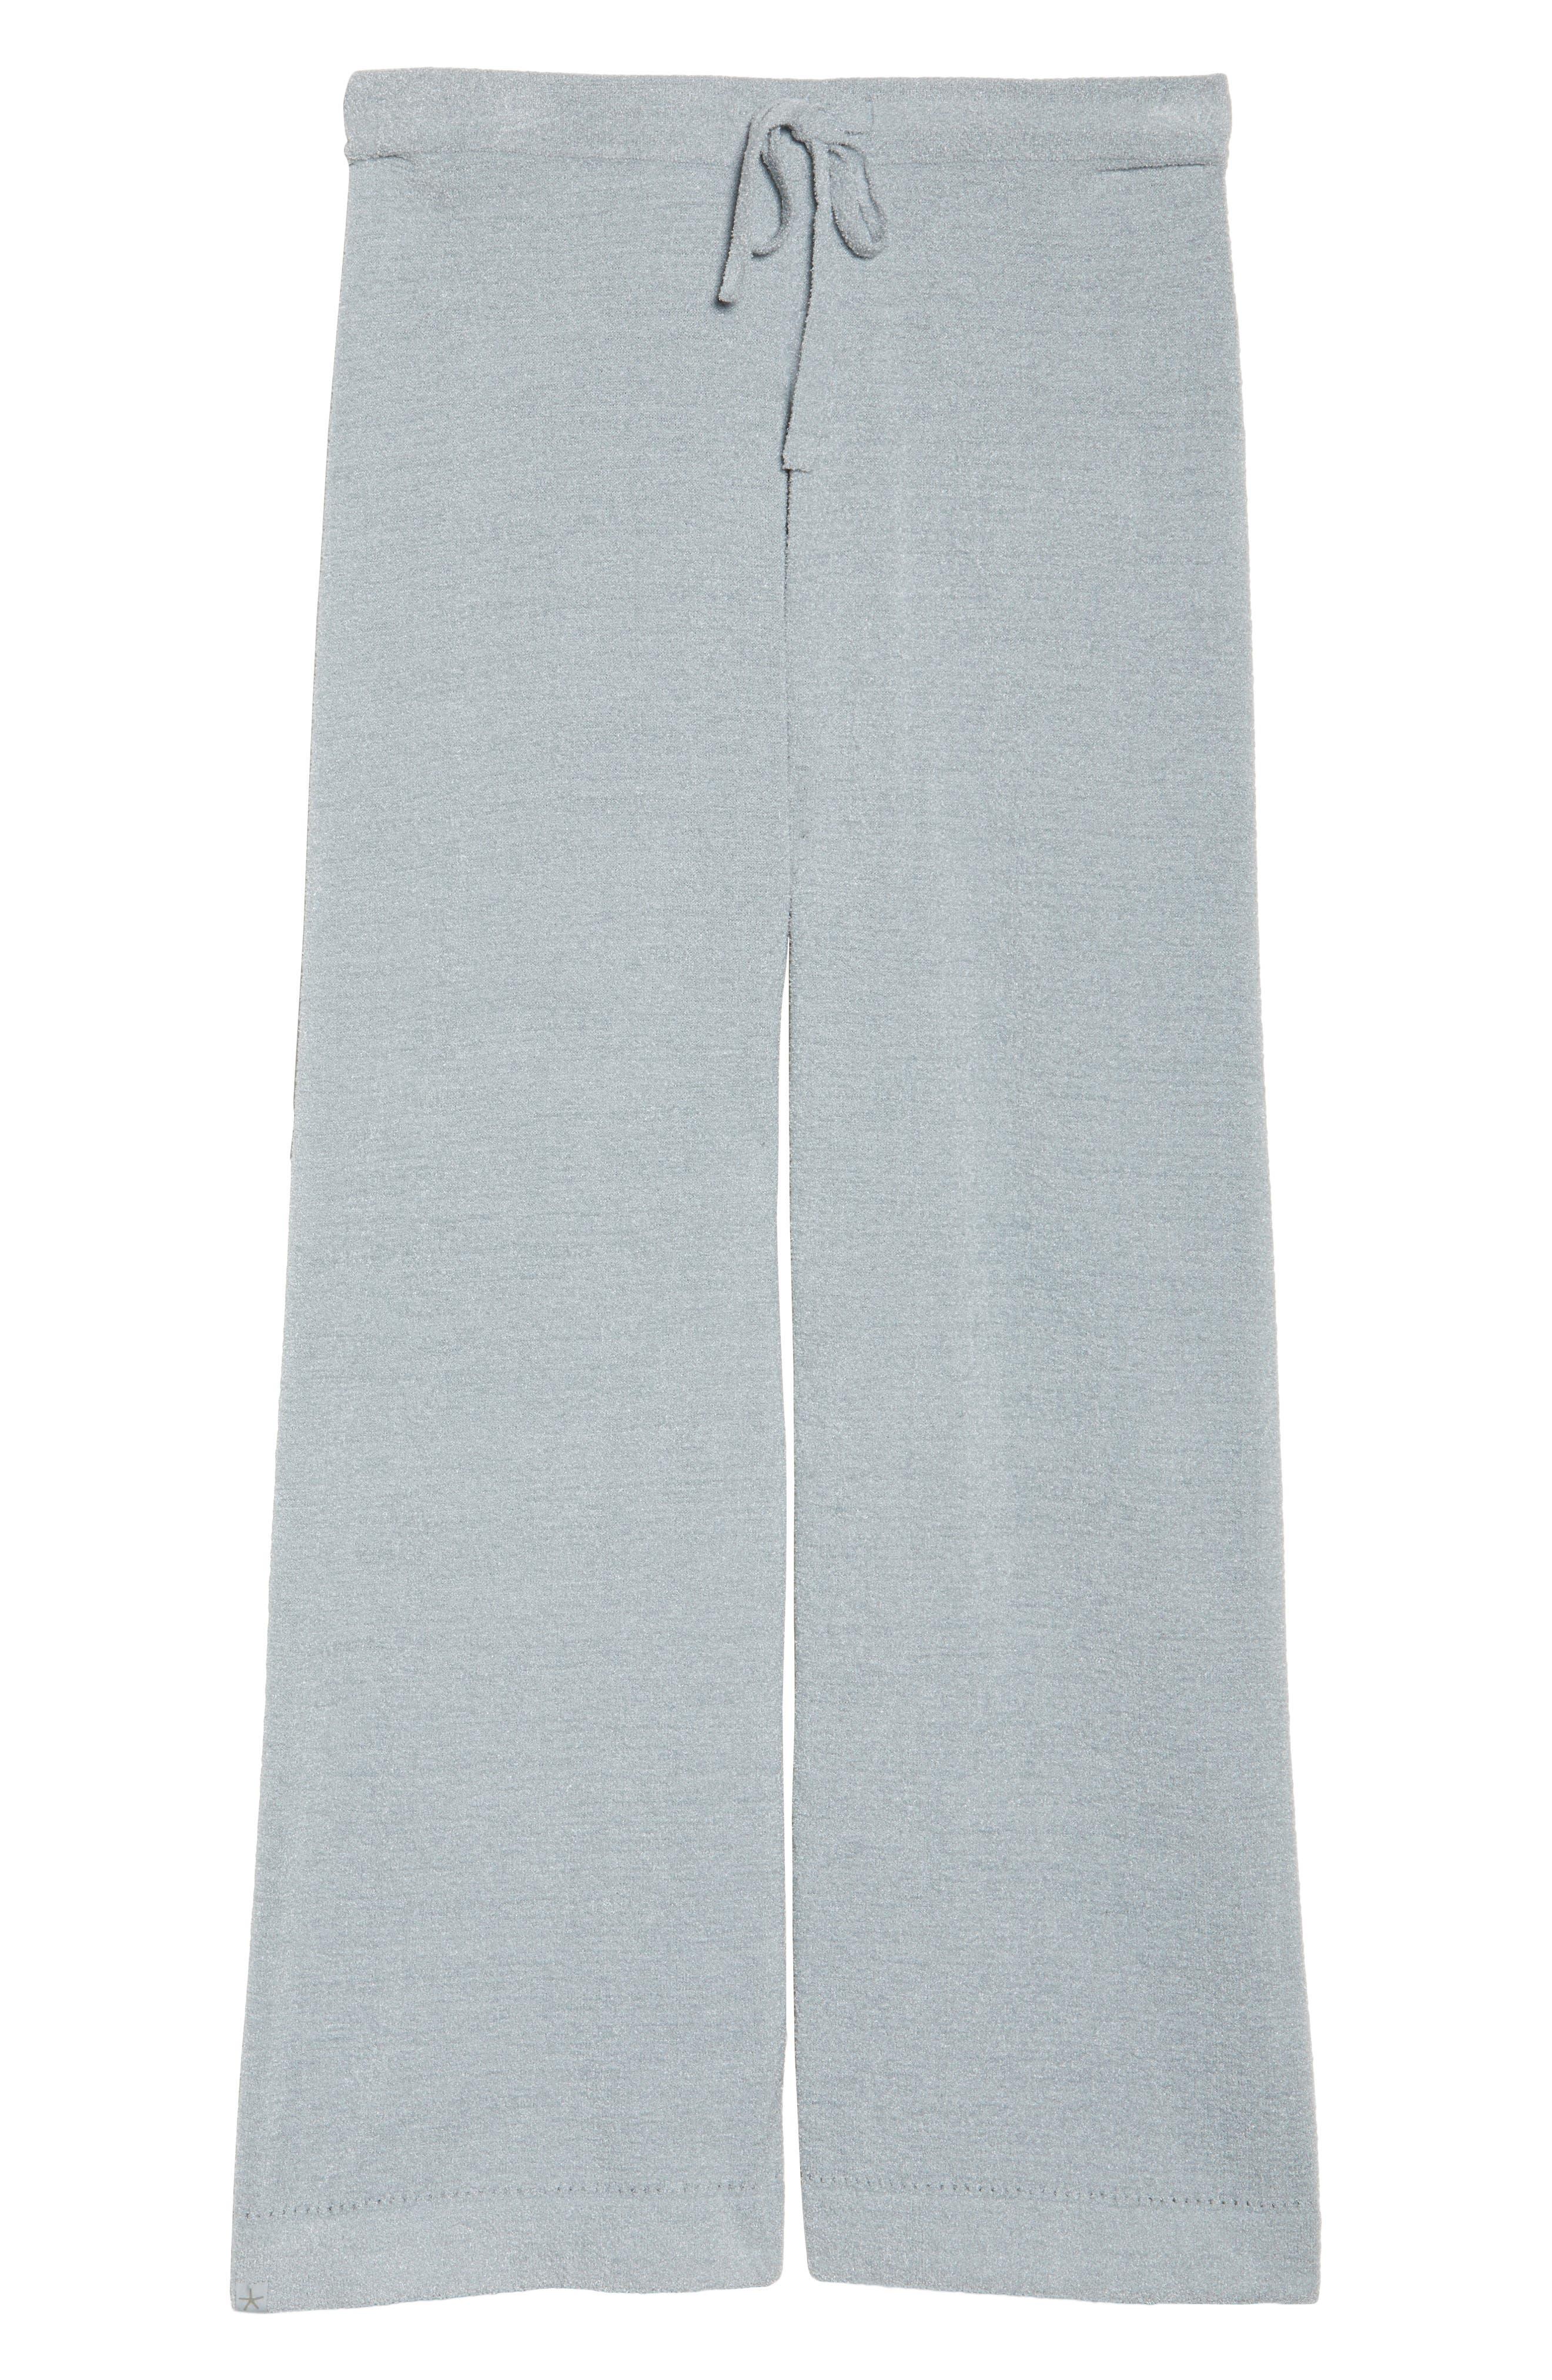 Cozychic Ultra Lite<sup>®</sup> Culotte Lounge Pants,                             Alternate thumbnail 4, color,                             Blue Water